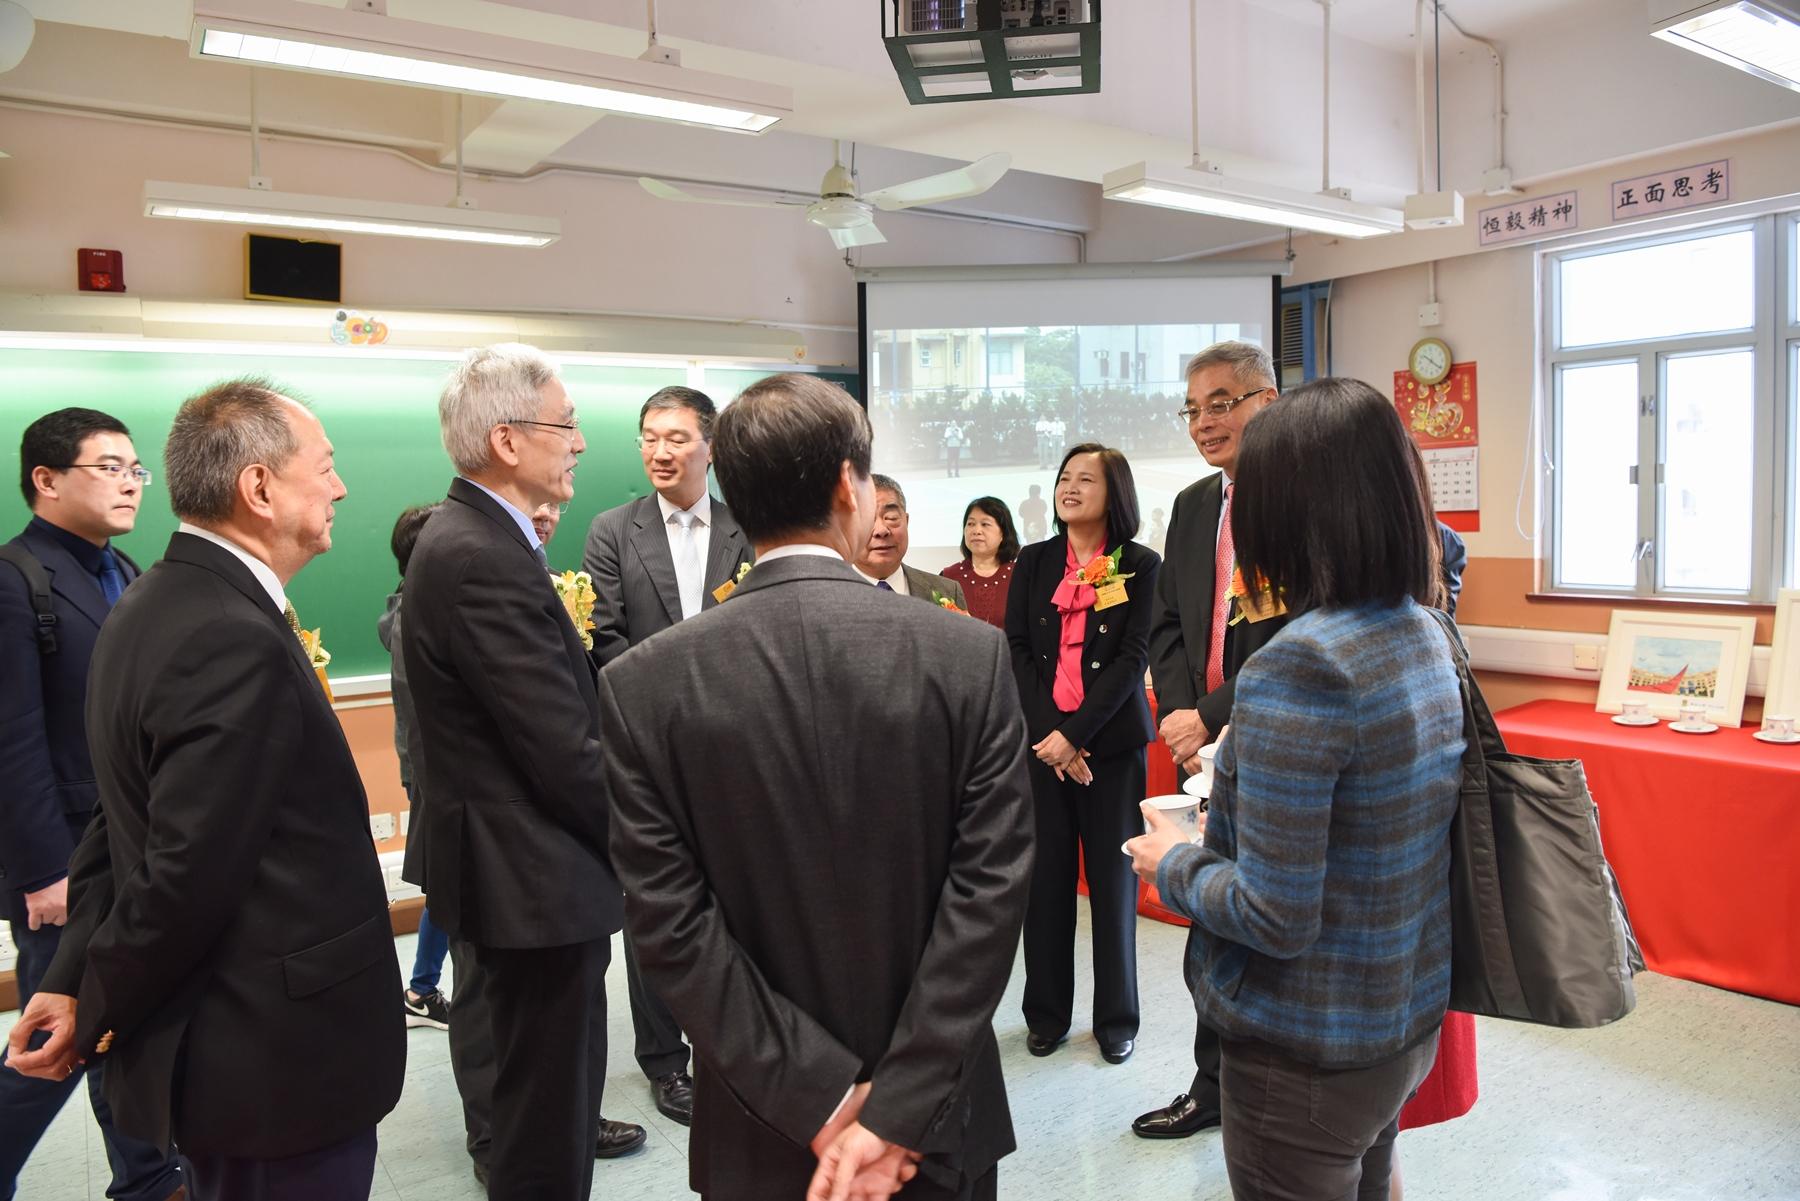 http://npc.edu.hk/sites/default/files/01_dsc_3365.jpg